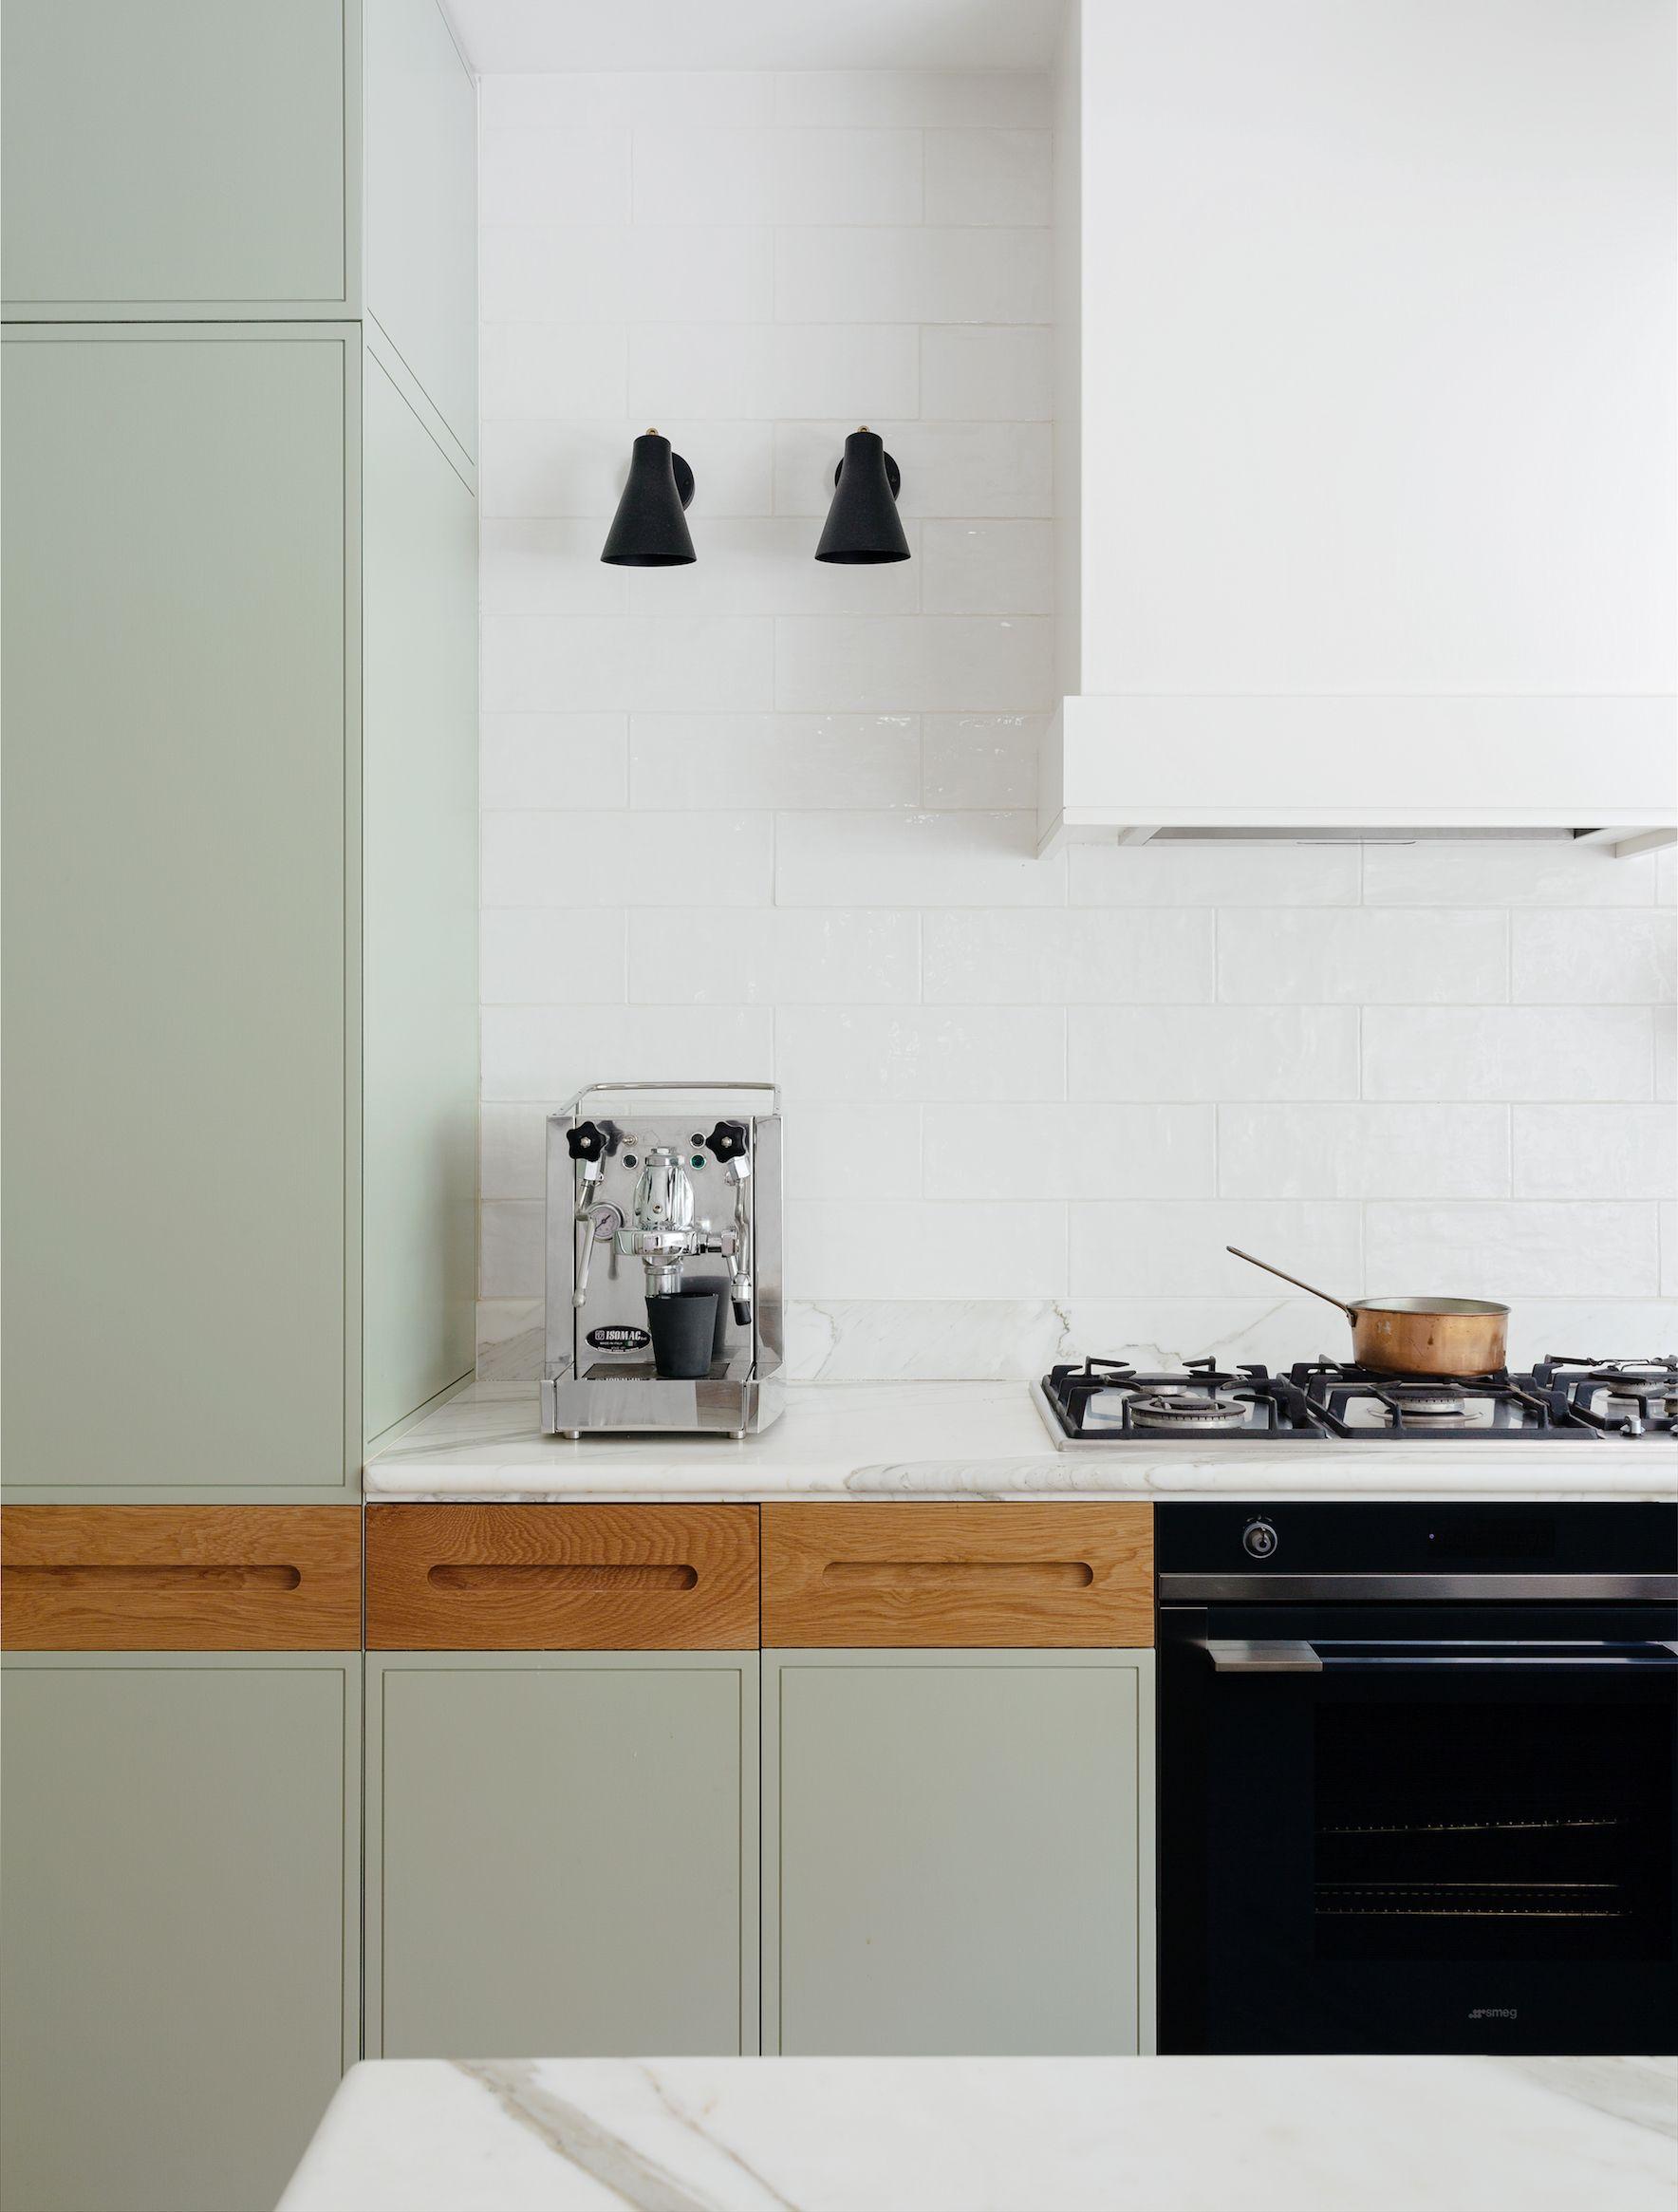 Pin by nina purdey on kitchen pinterest kitchen kitchen remodel